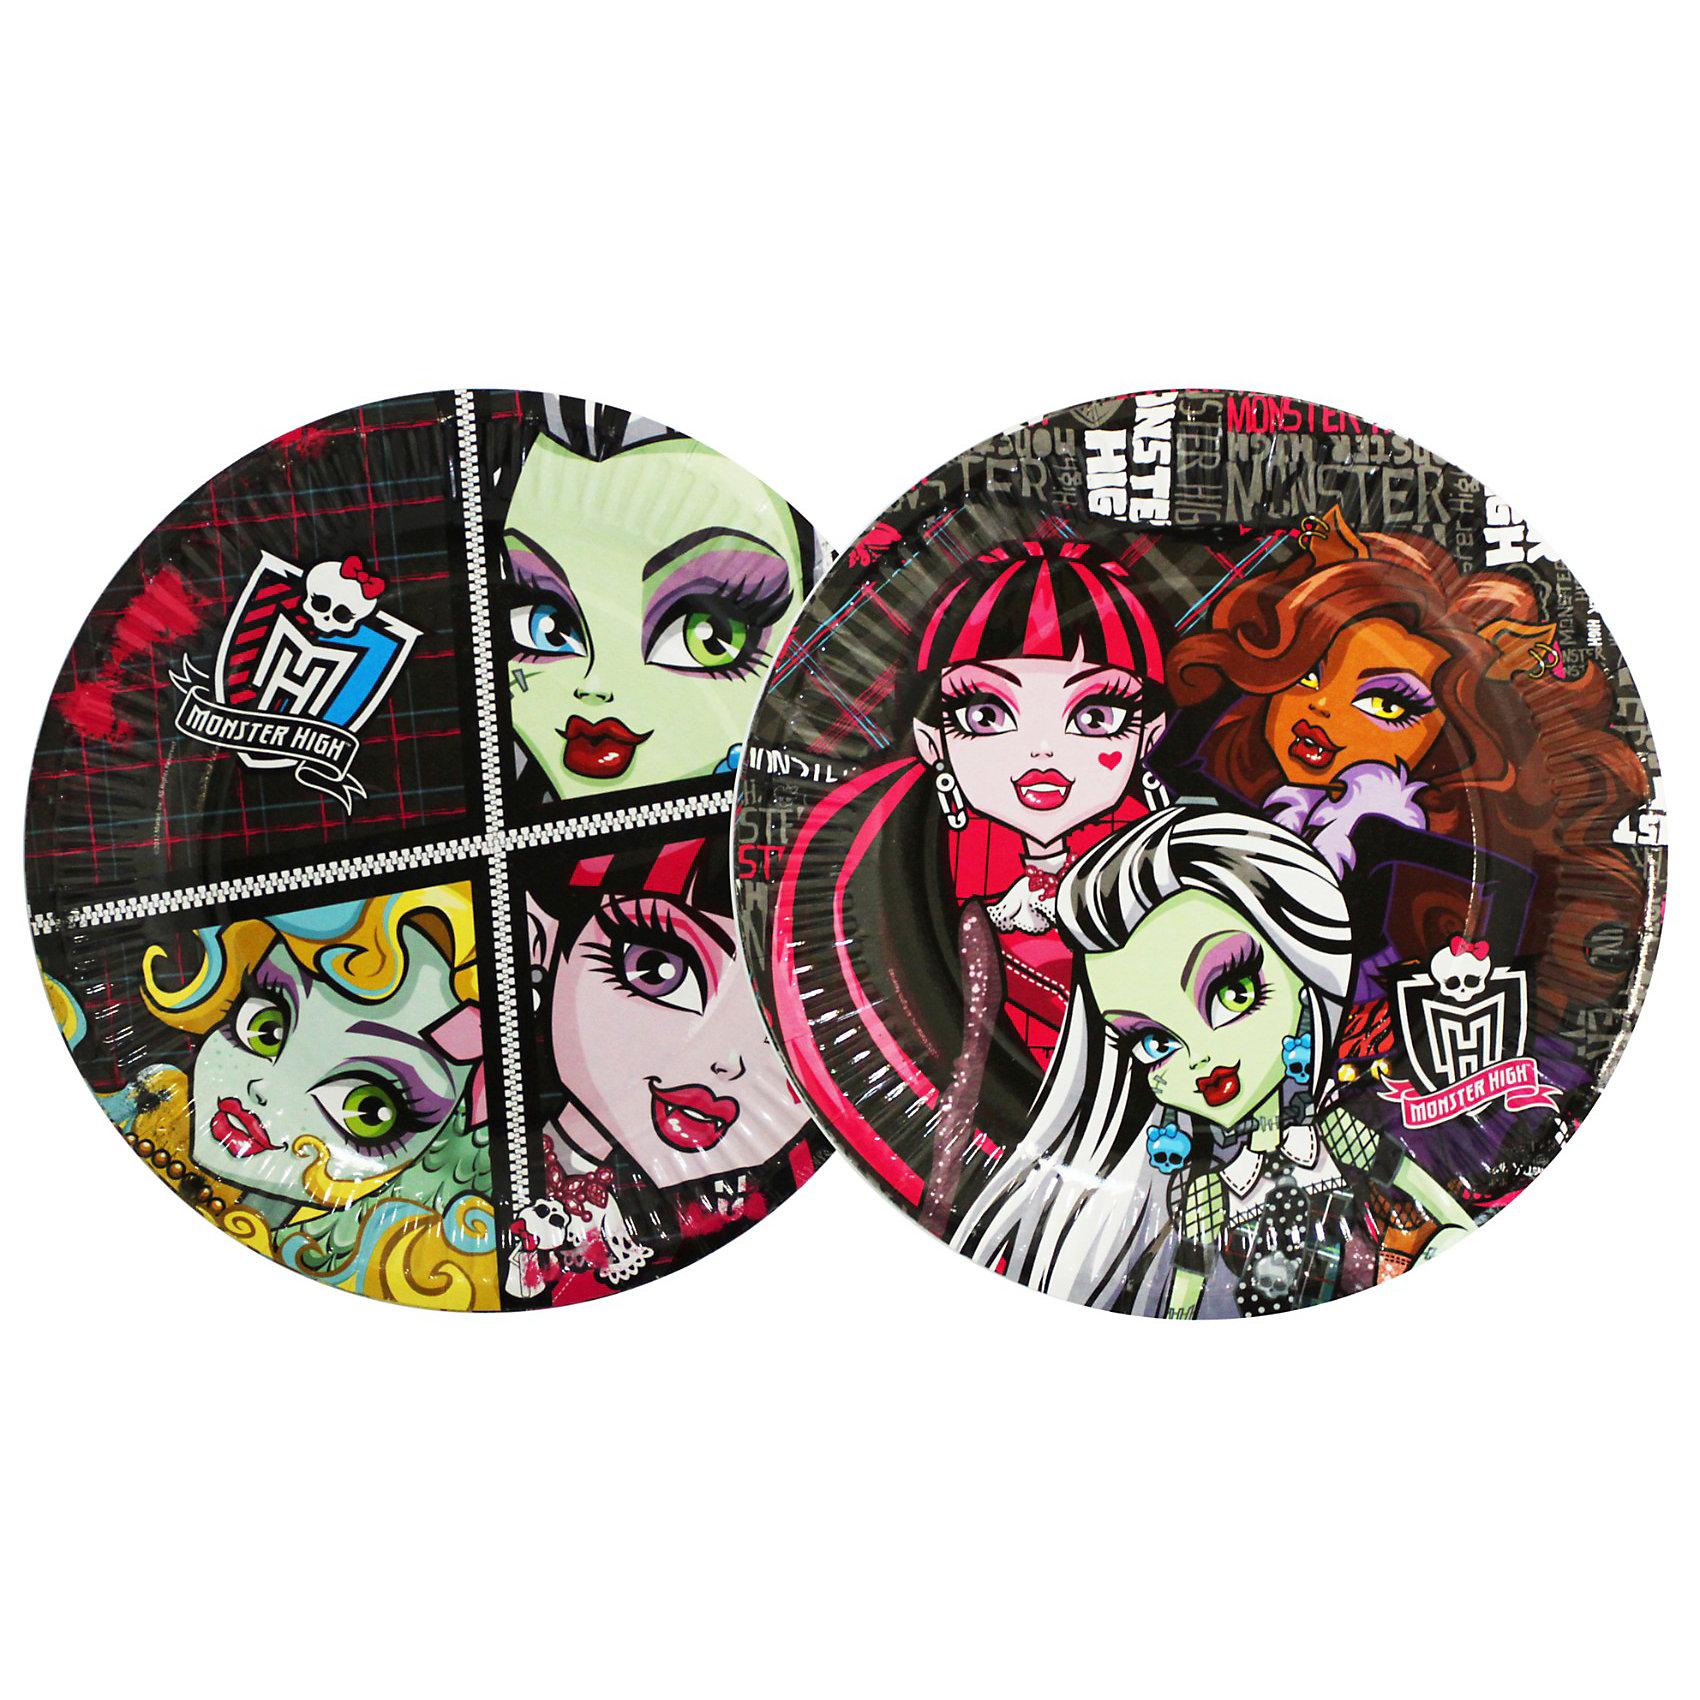 Тарелка бумажная, Monster High, 10шт., 23см, в ассорт.